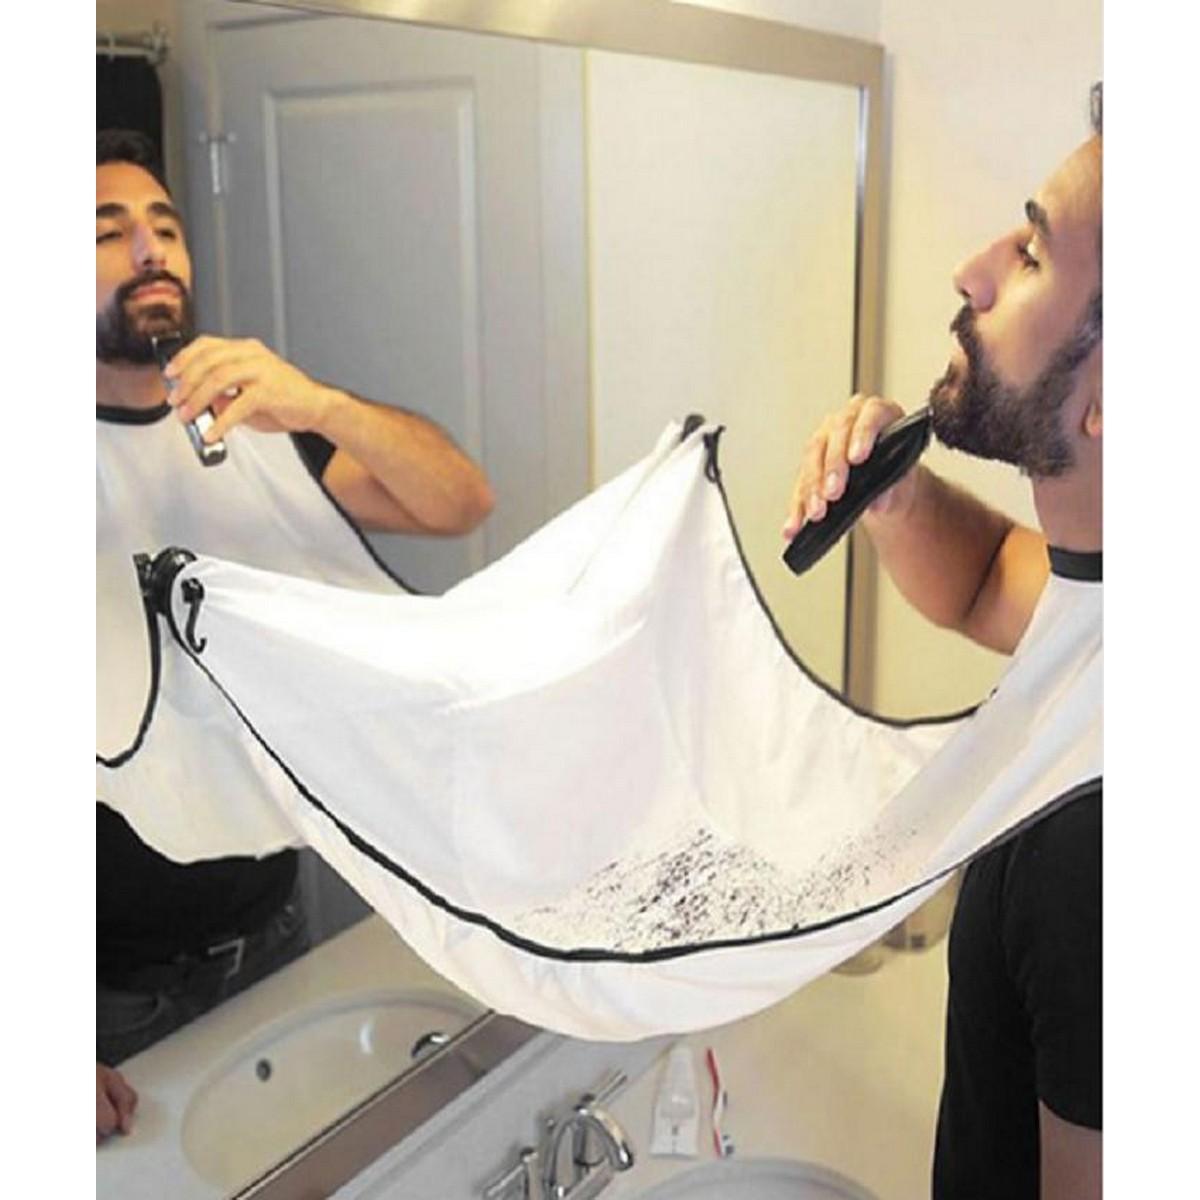 1pcs Male Beard Apron Shaving Aprons Beard Care Clean Catcher New Year Gift Father Boyfriend Brother Bib Trimmer Facial 120x80cm